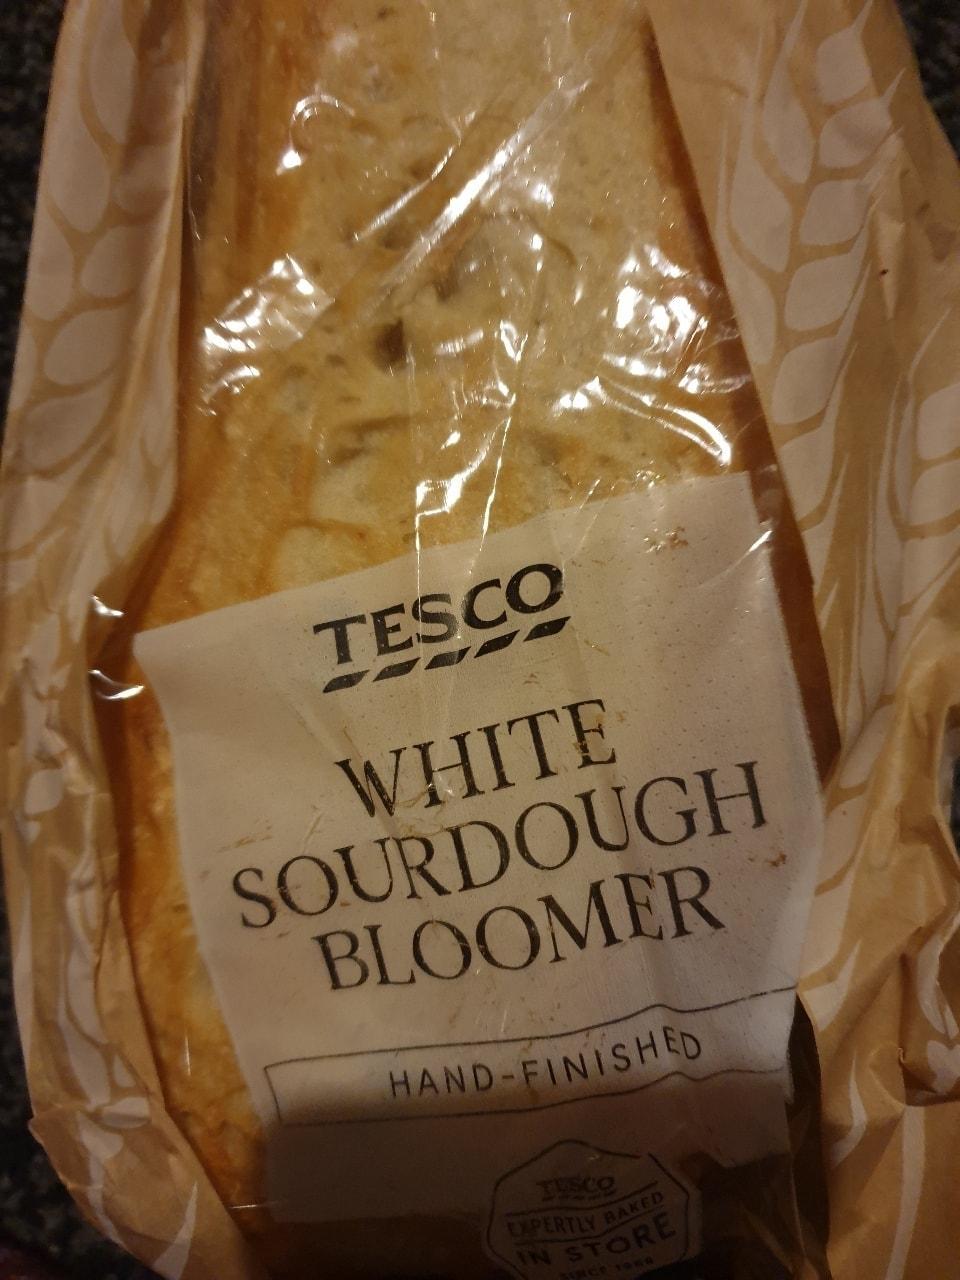 White sourdough bloomer